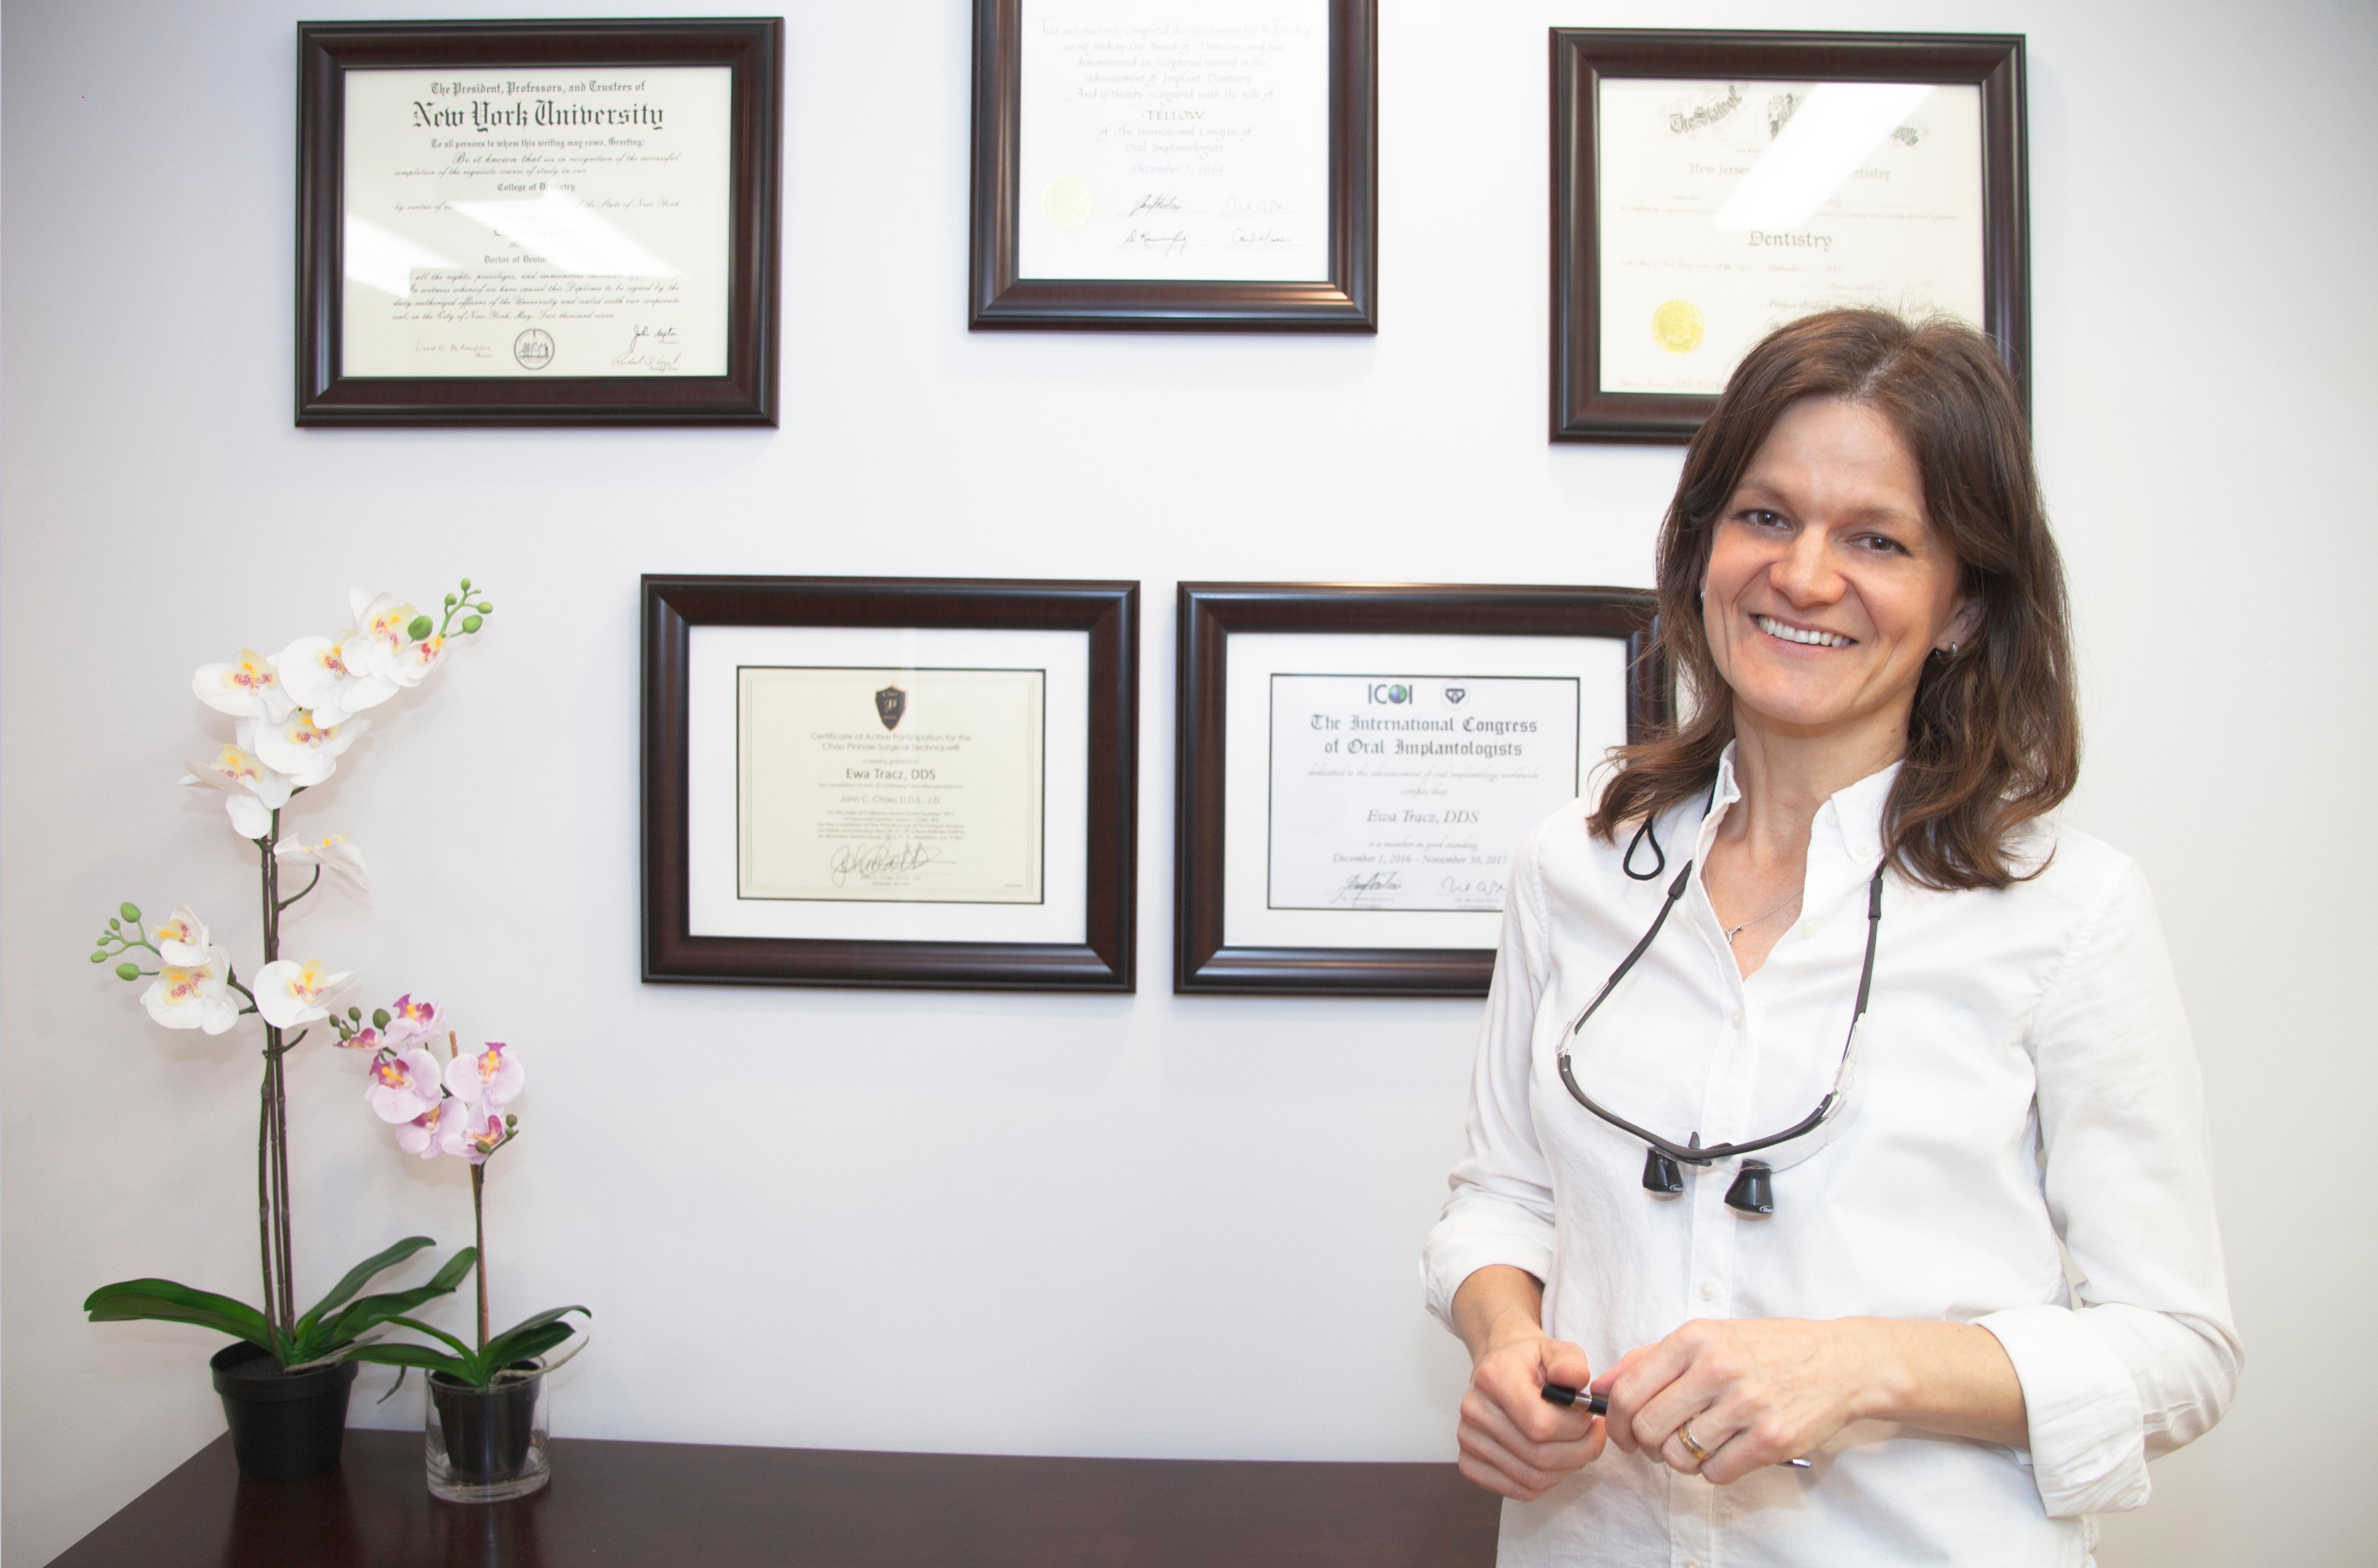 Heights Dental NY - Dr. Ewa Tracz, D.D.S. image 2